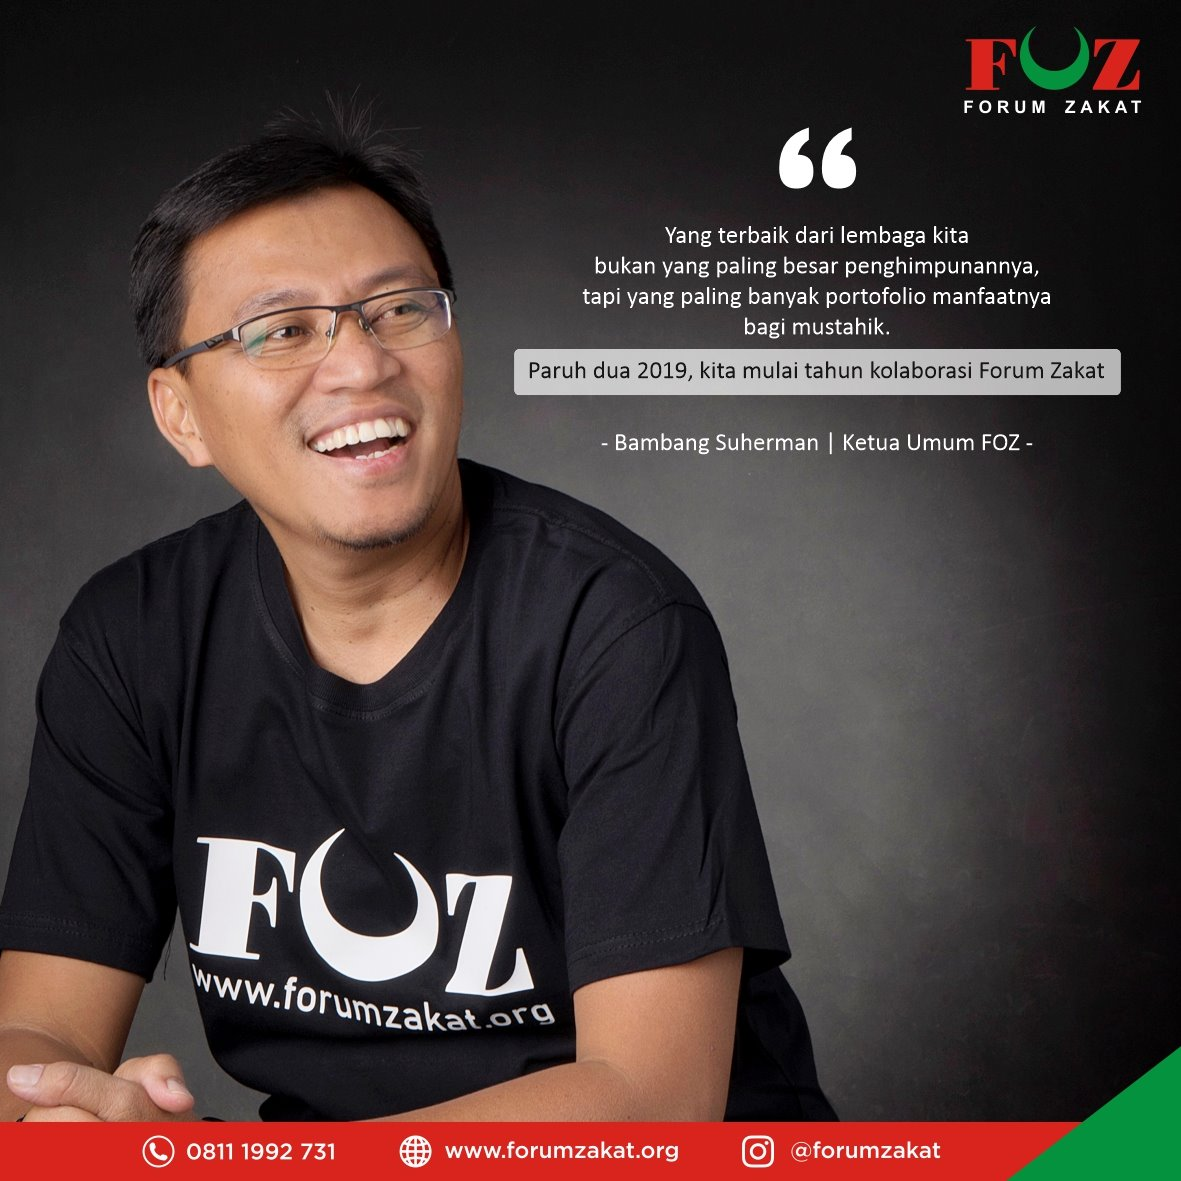 FOZ Dorong Terjadinya Kolaborasi Antar Lembaga Zakat